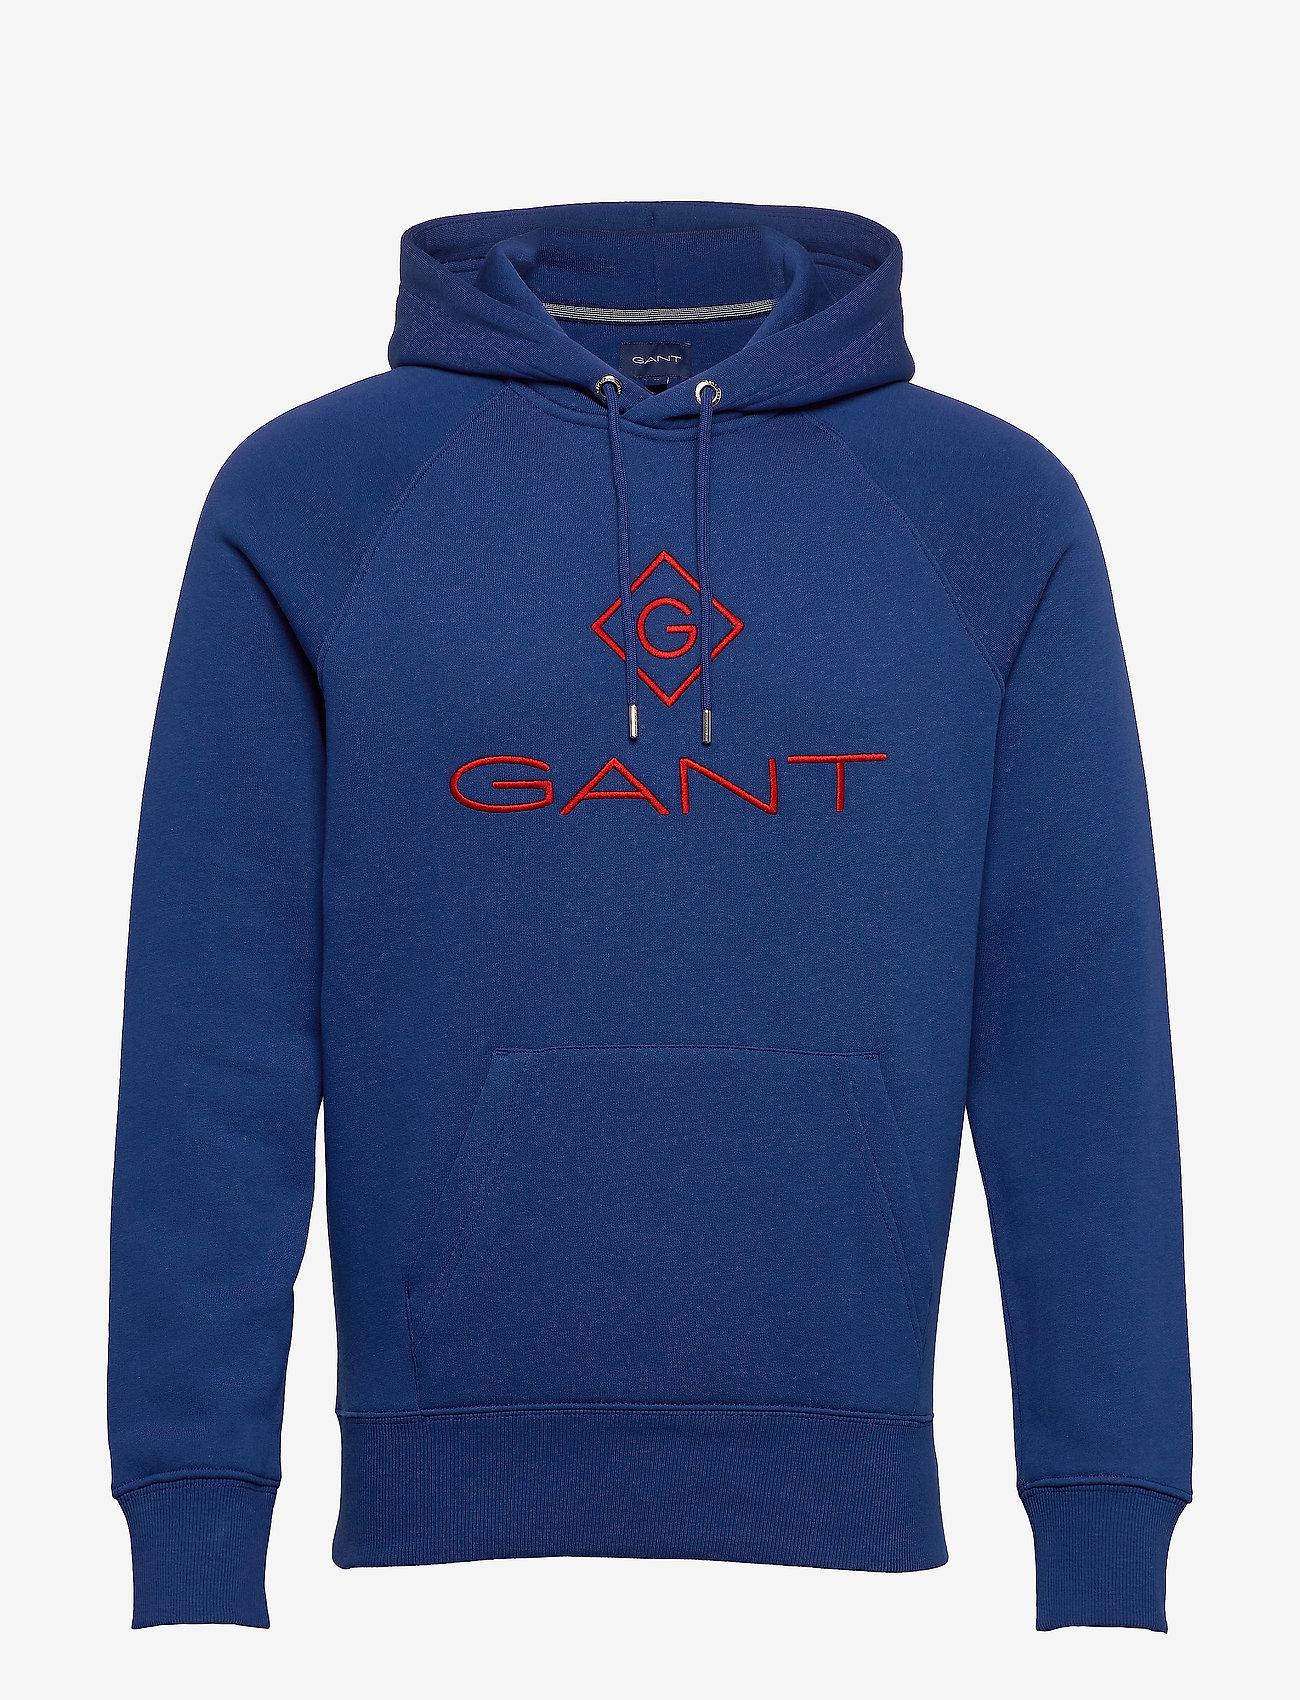 GANT - D1. COLOR LOCK UP HOODIE - crisp blue - 0